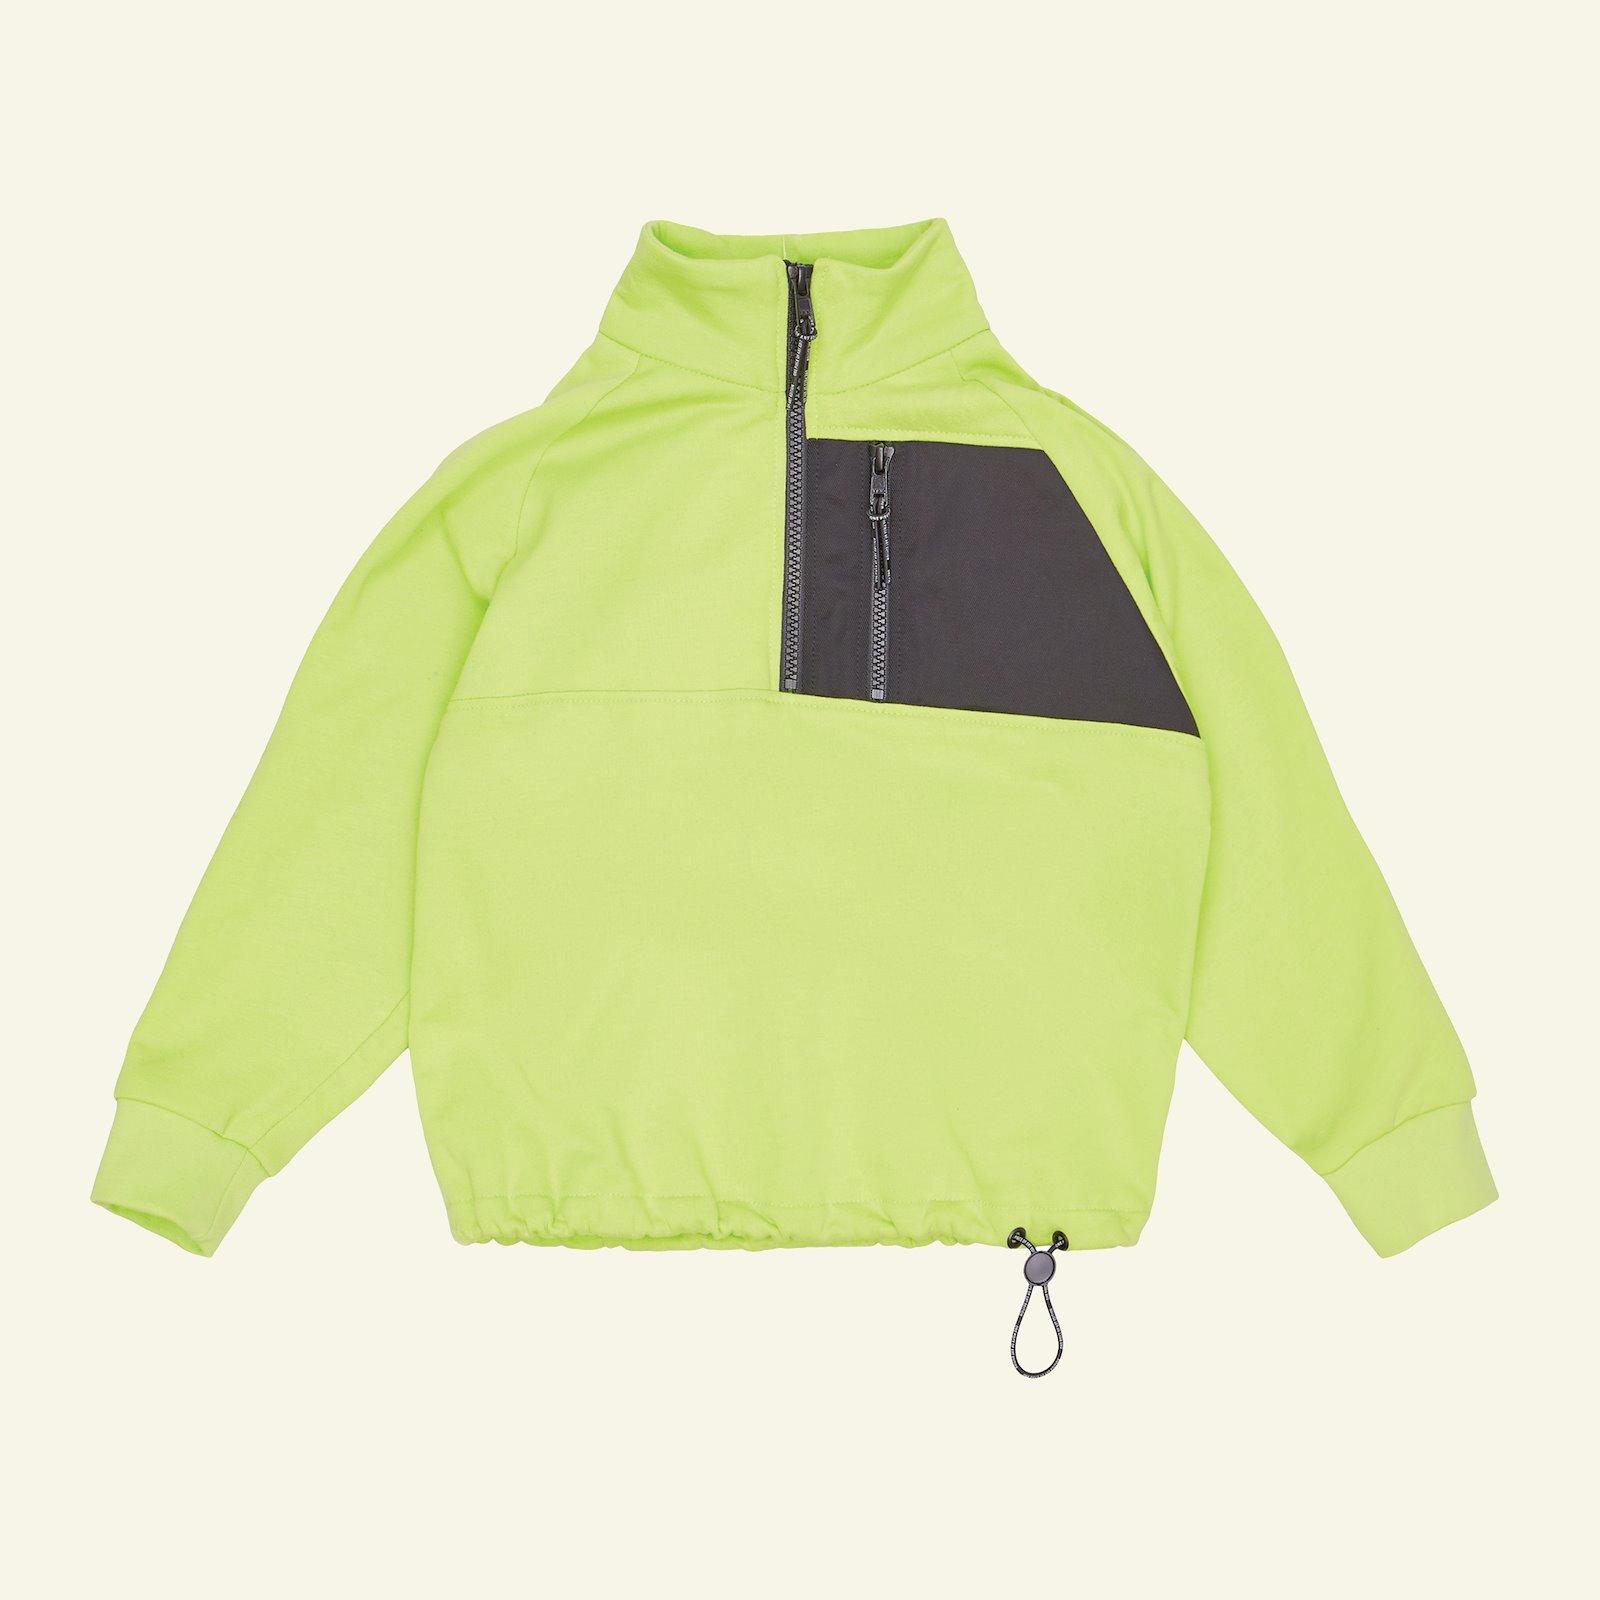 Anorak and jacket, 128/8y p64020_211770_230056_450012_sskit